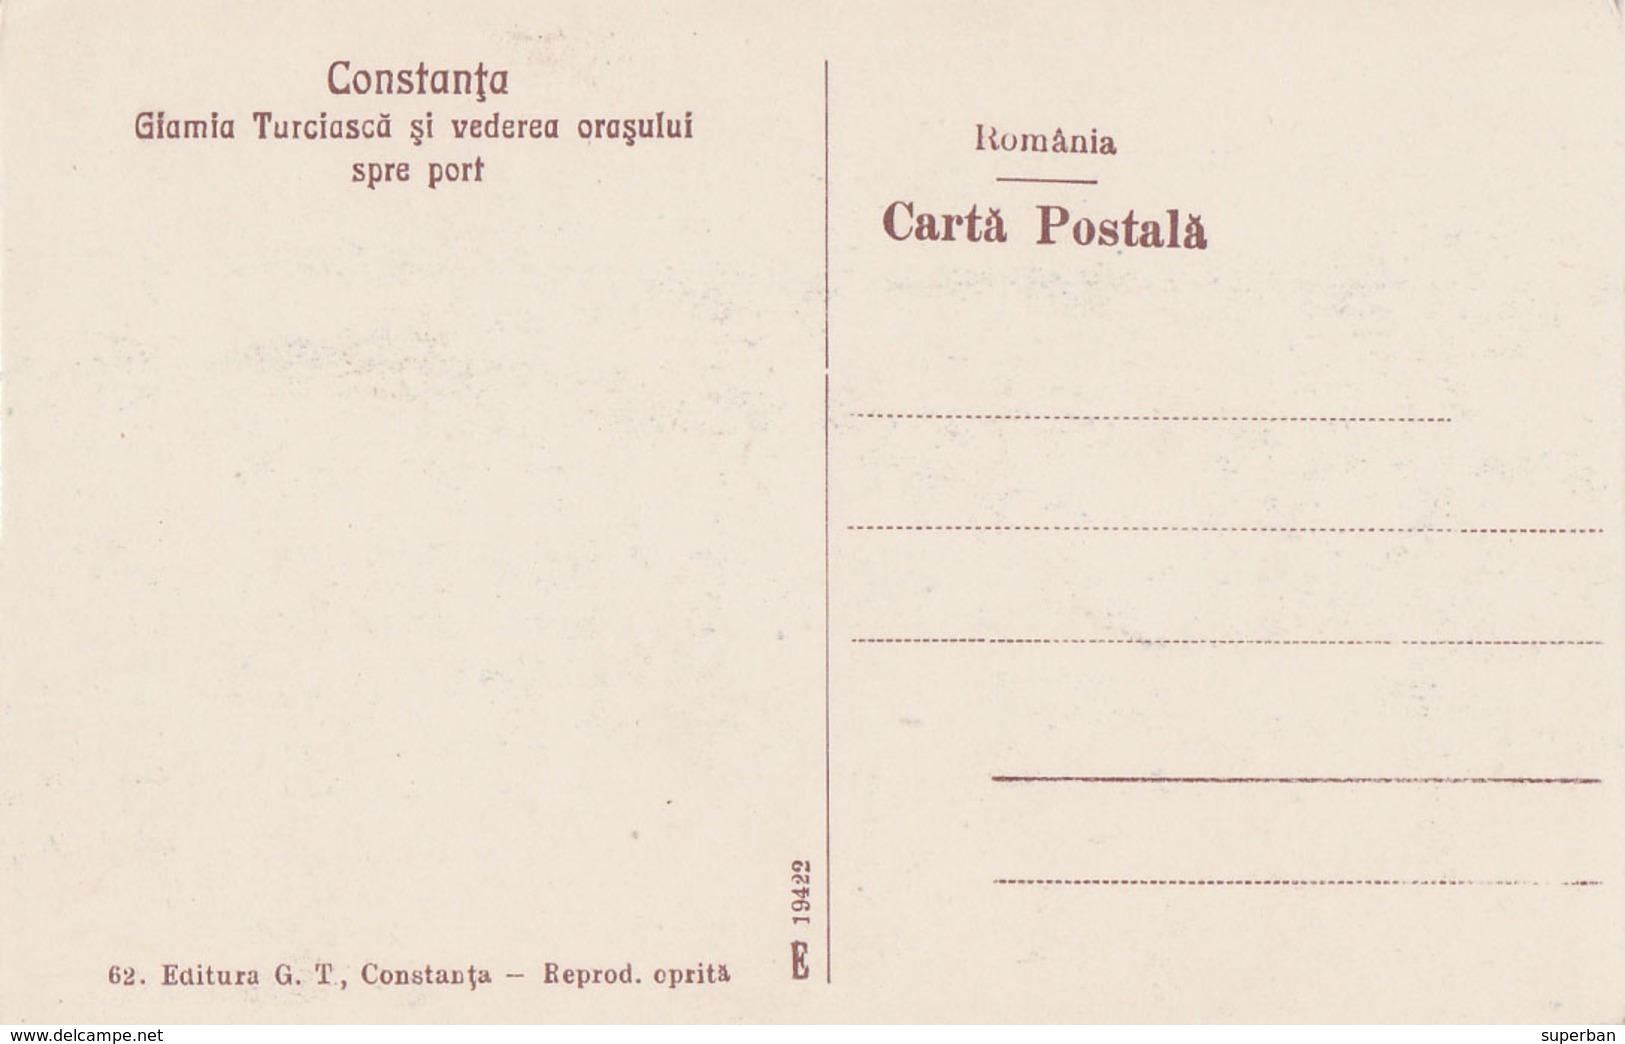 CONSTANTA / ROMANIA : GIAMIA TURCEASCA... [ NOCTURNA / À LA LUNE / NIGHT VIEW ] ~ 1925 - '930 (ac925) - Roumanie